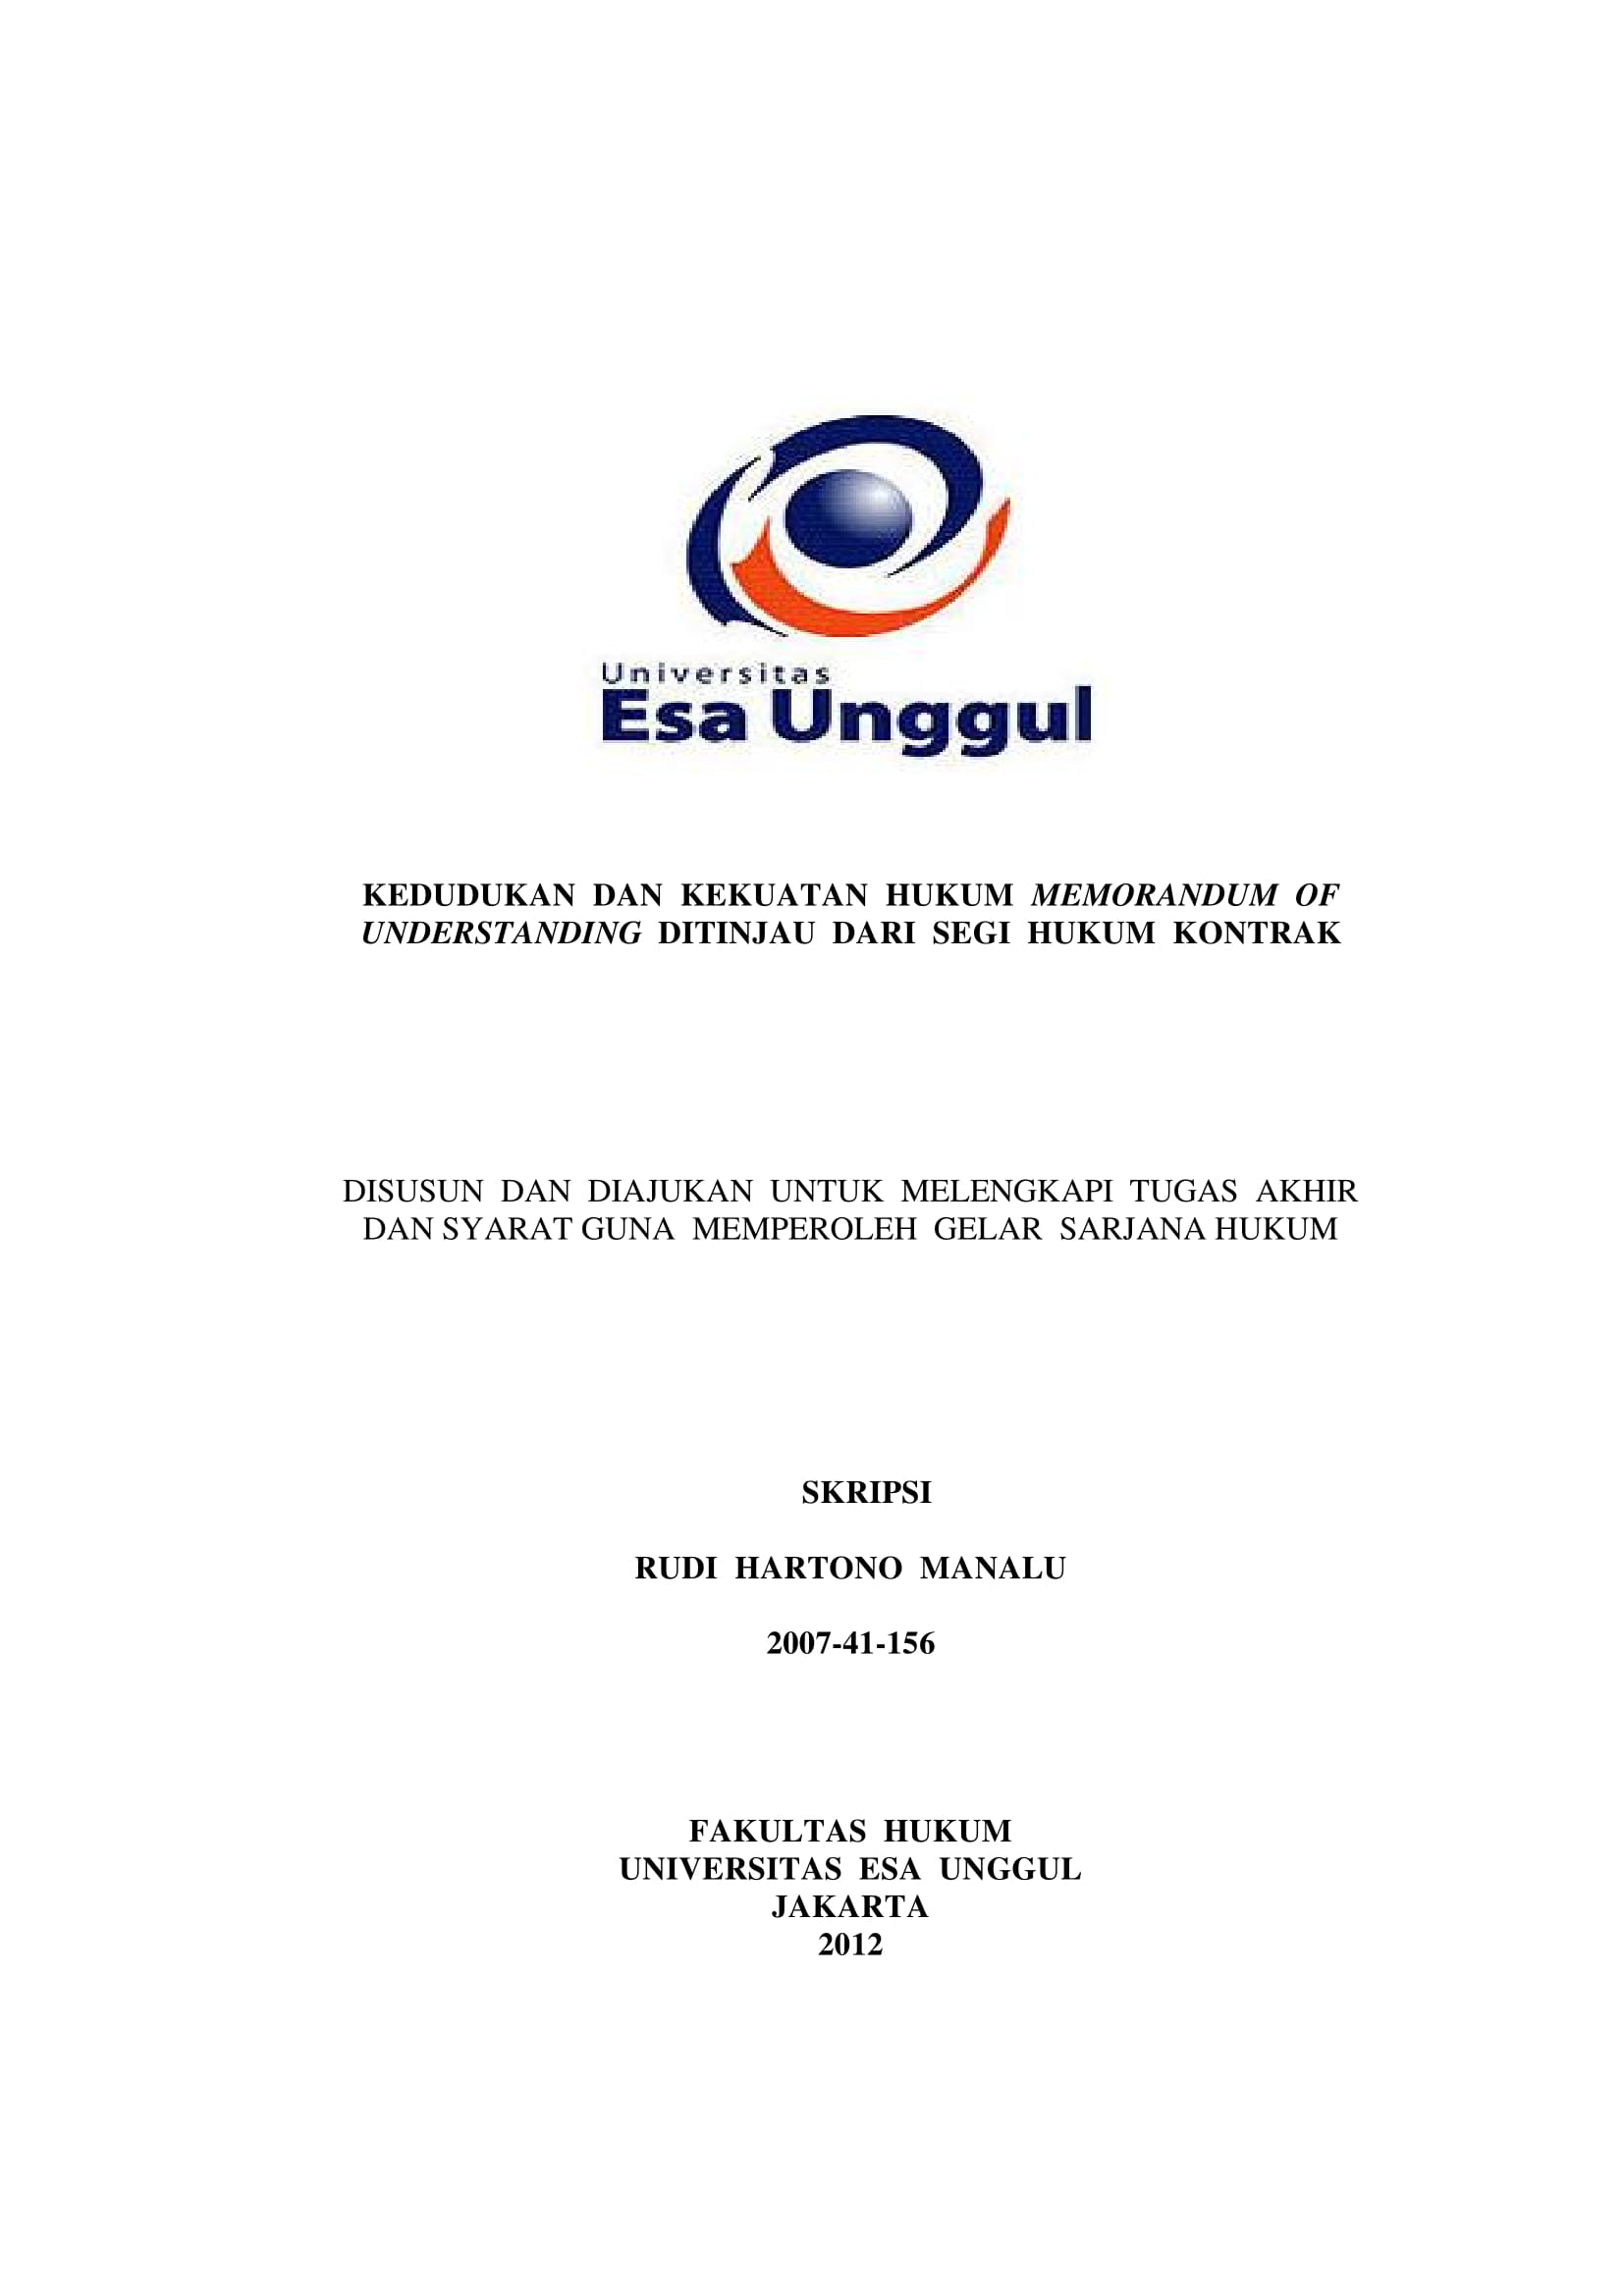 Kedudukan Dan Kekuatan Hukum Memorandum Of Understanding Ditinjau Dari Segi Hukum Kontrak